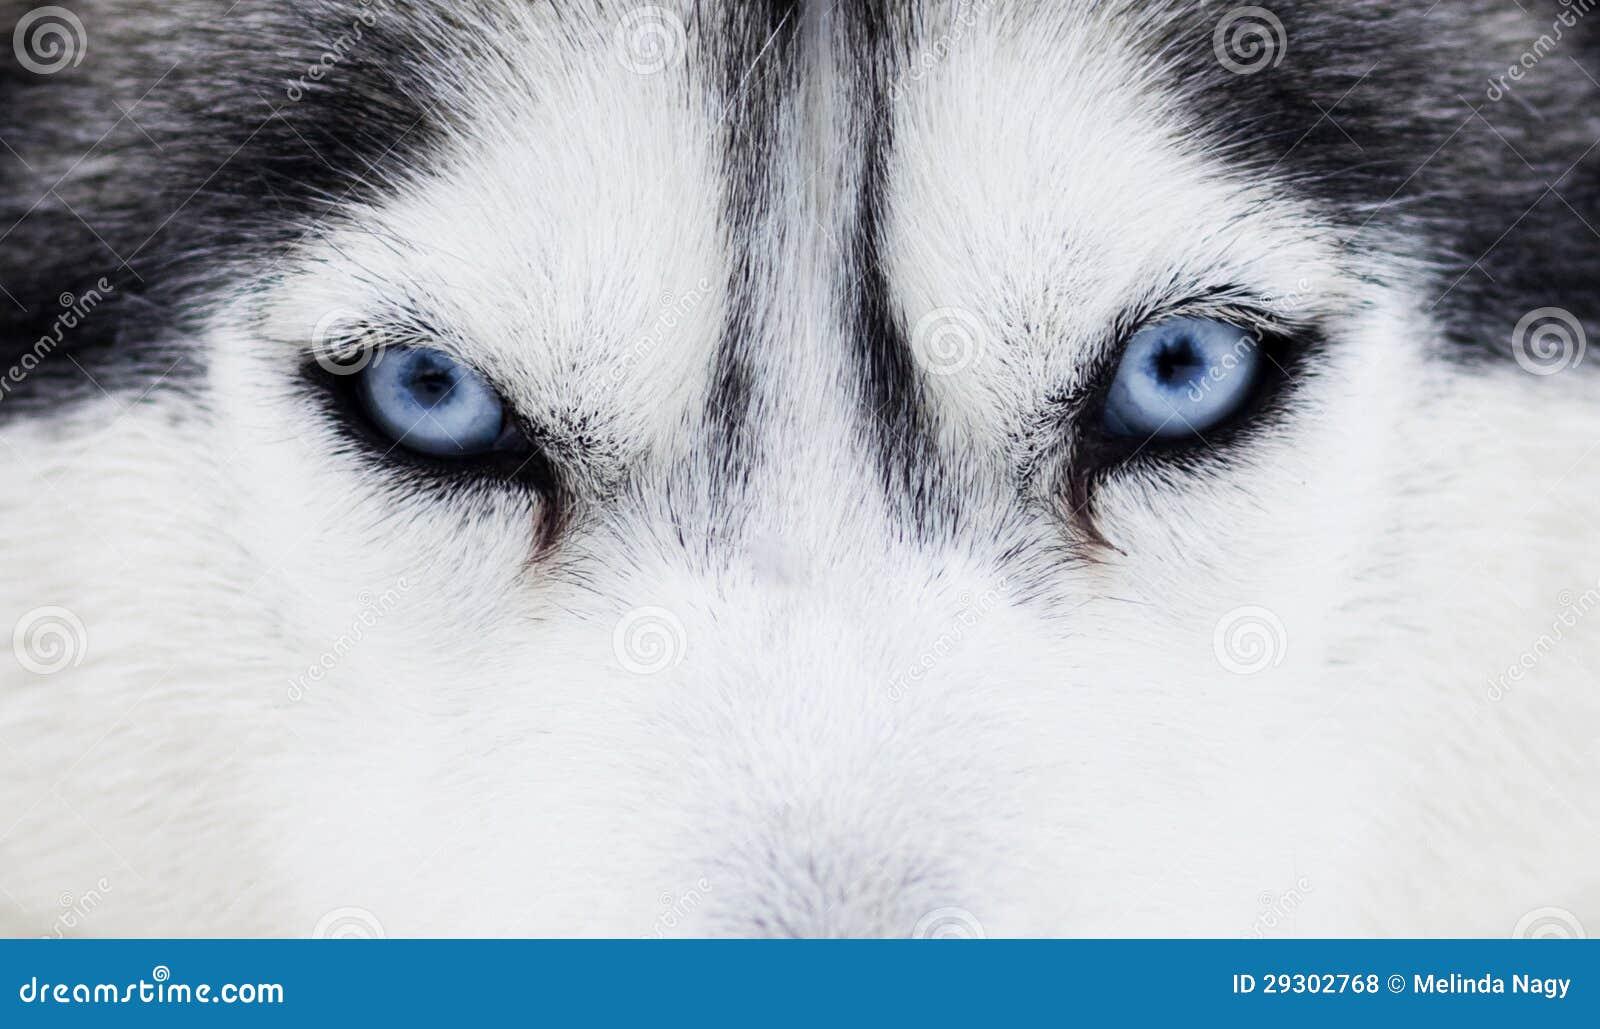 close-up-blue-eyes-dog-29302768.jpg